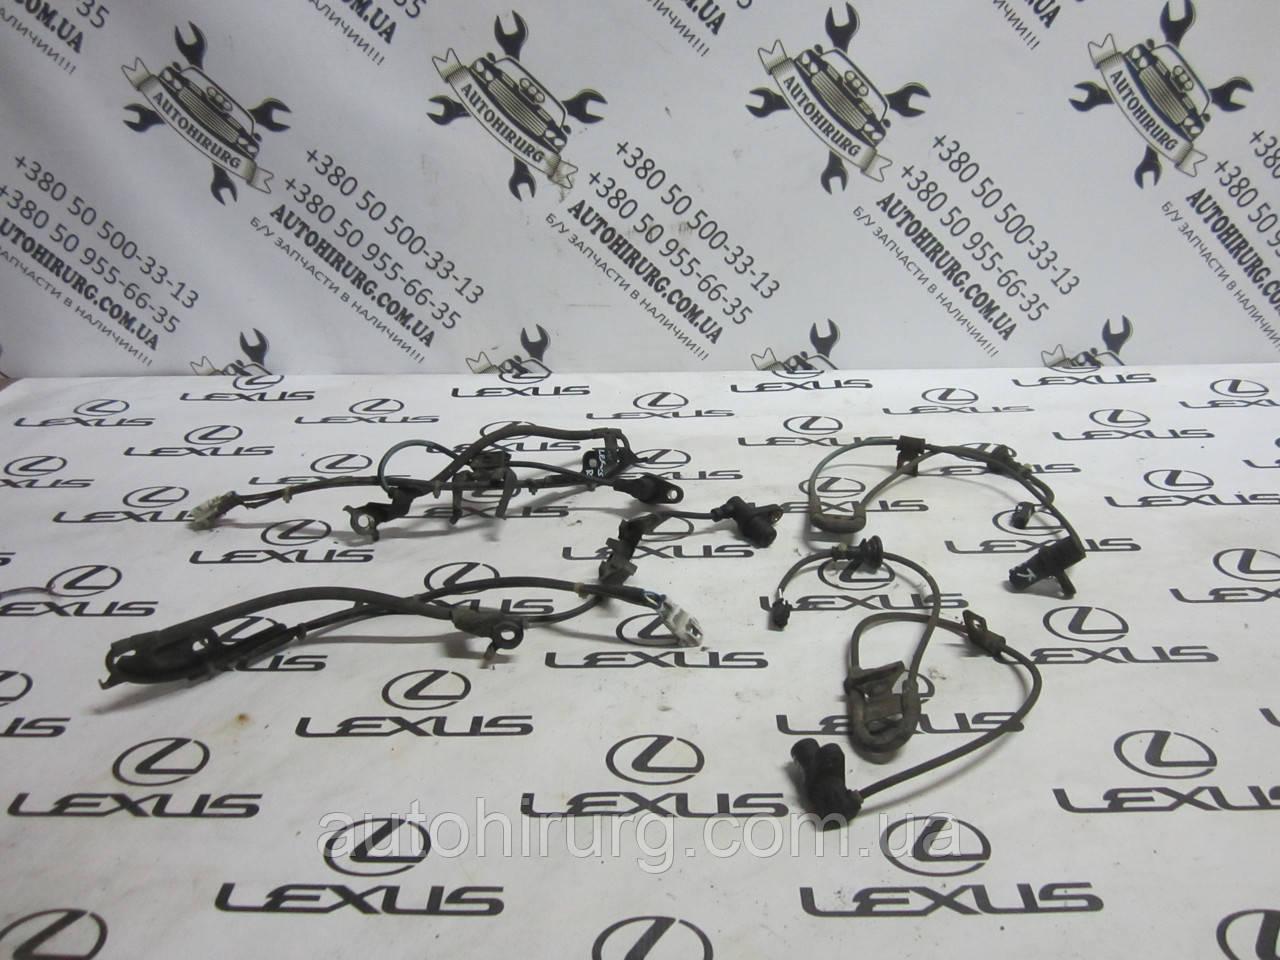 Датчик ABS Lexus RX300 (89543-48030 / 89546-48030), фото 1